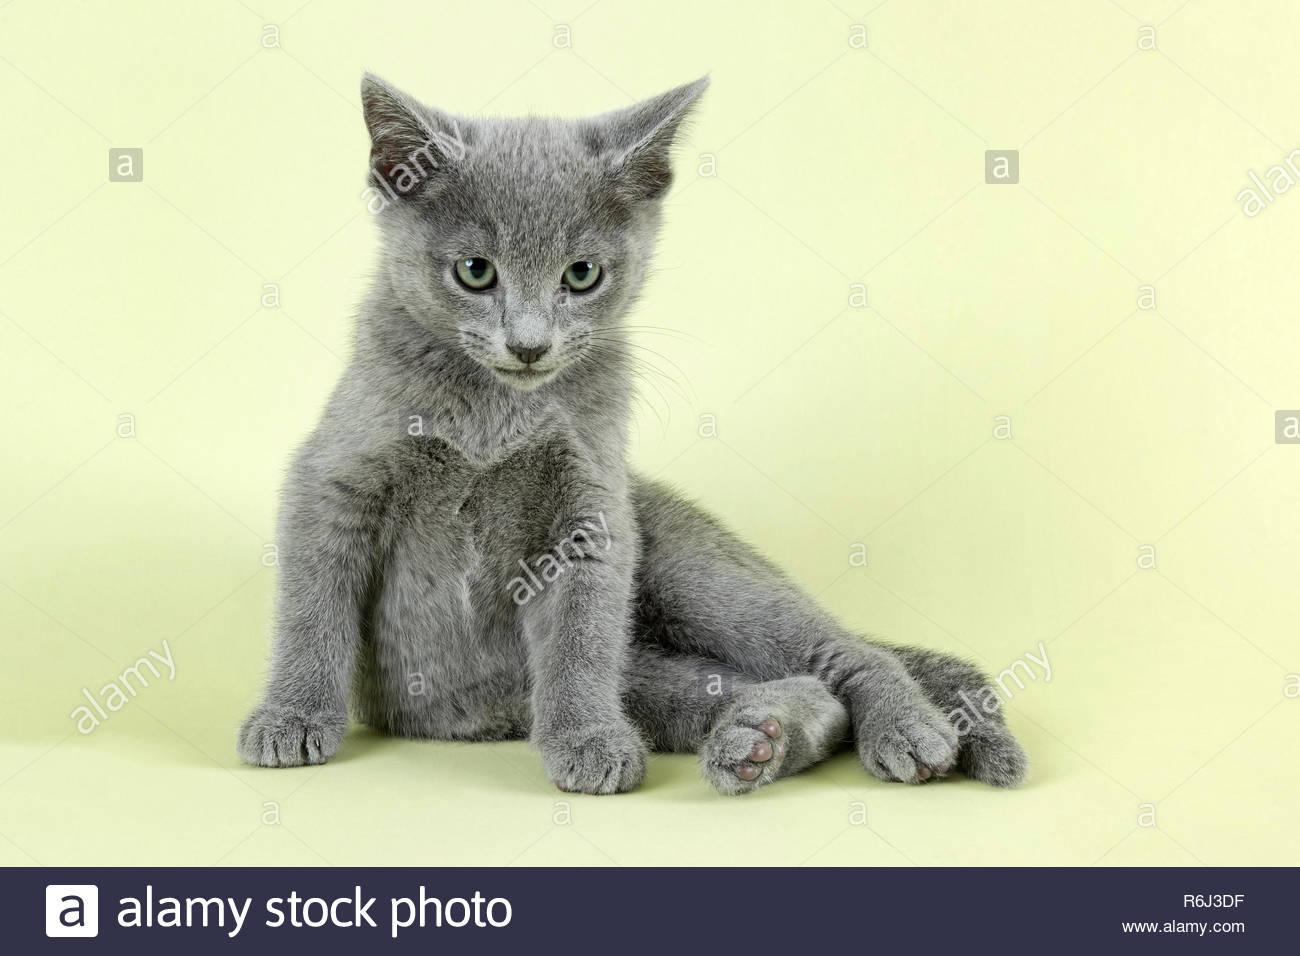 cat russian blue 33232 Stock Photo